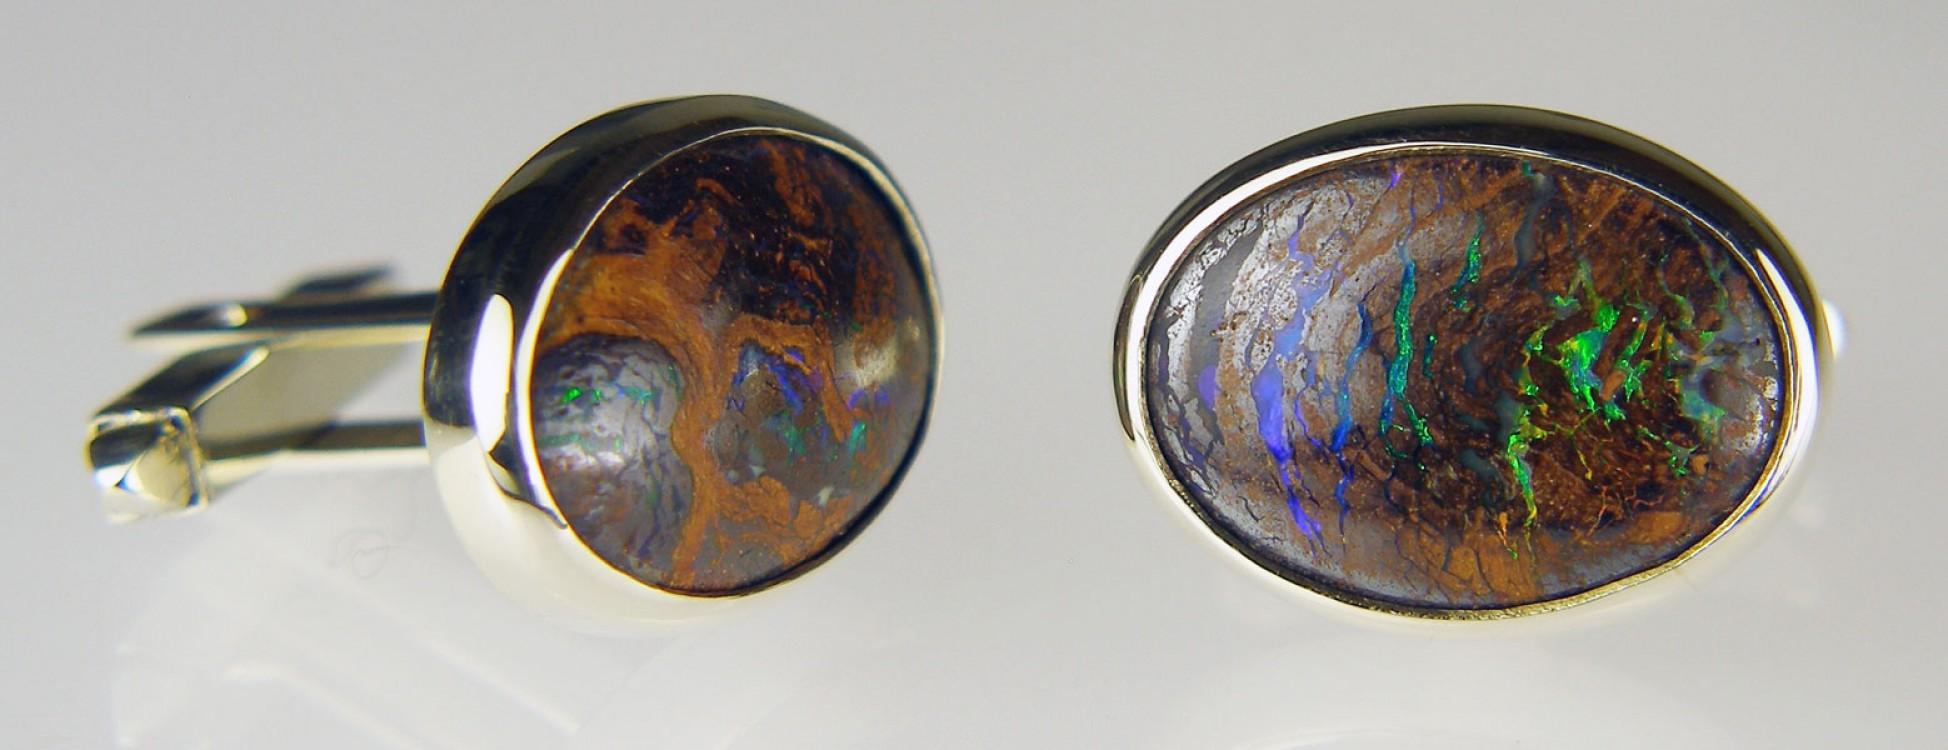 Fine Custom Jewellery Gallery Just Gems